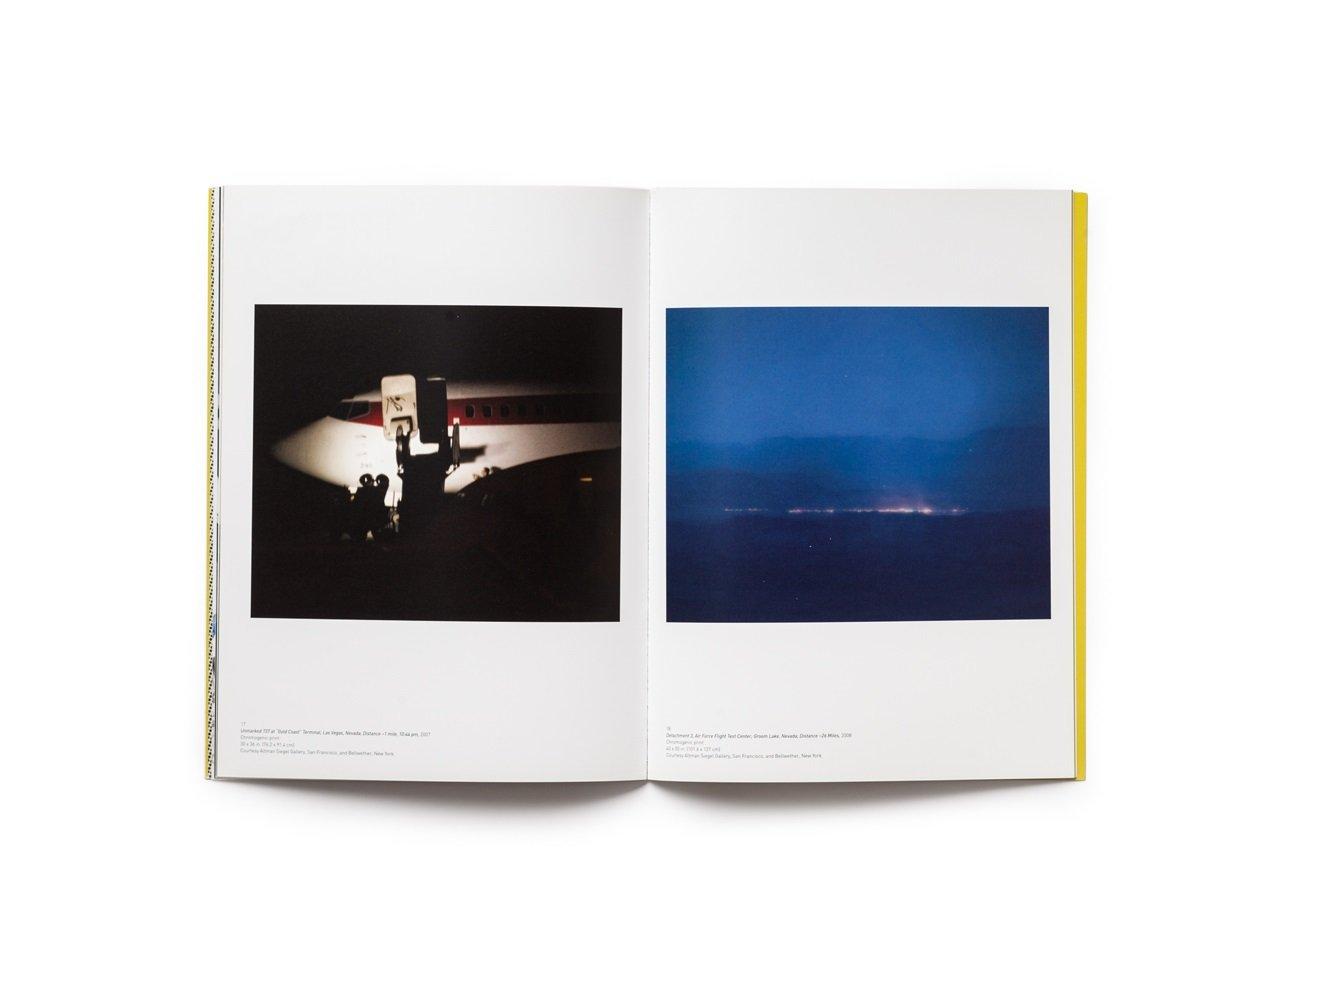 2008 SECA Art Award publication pages 14-15